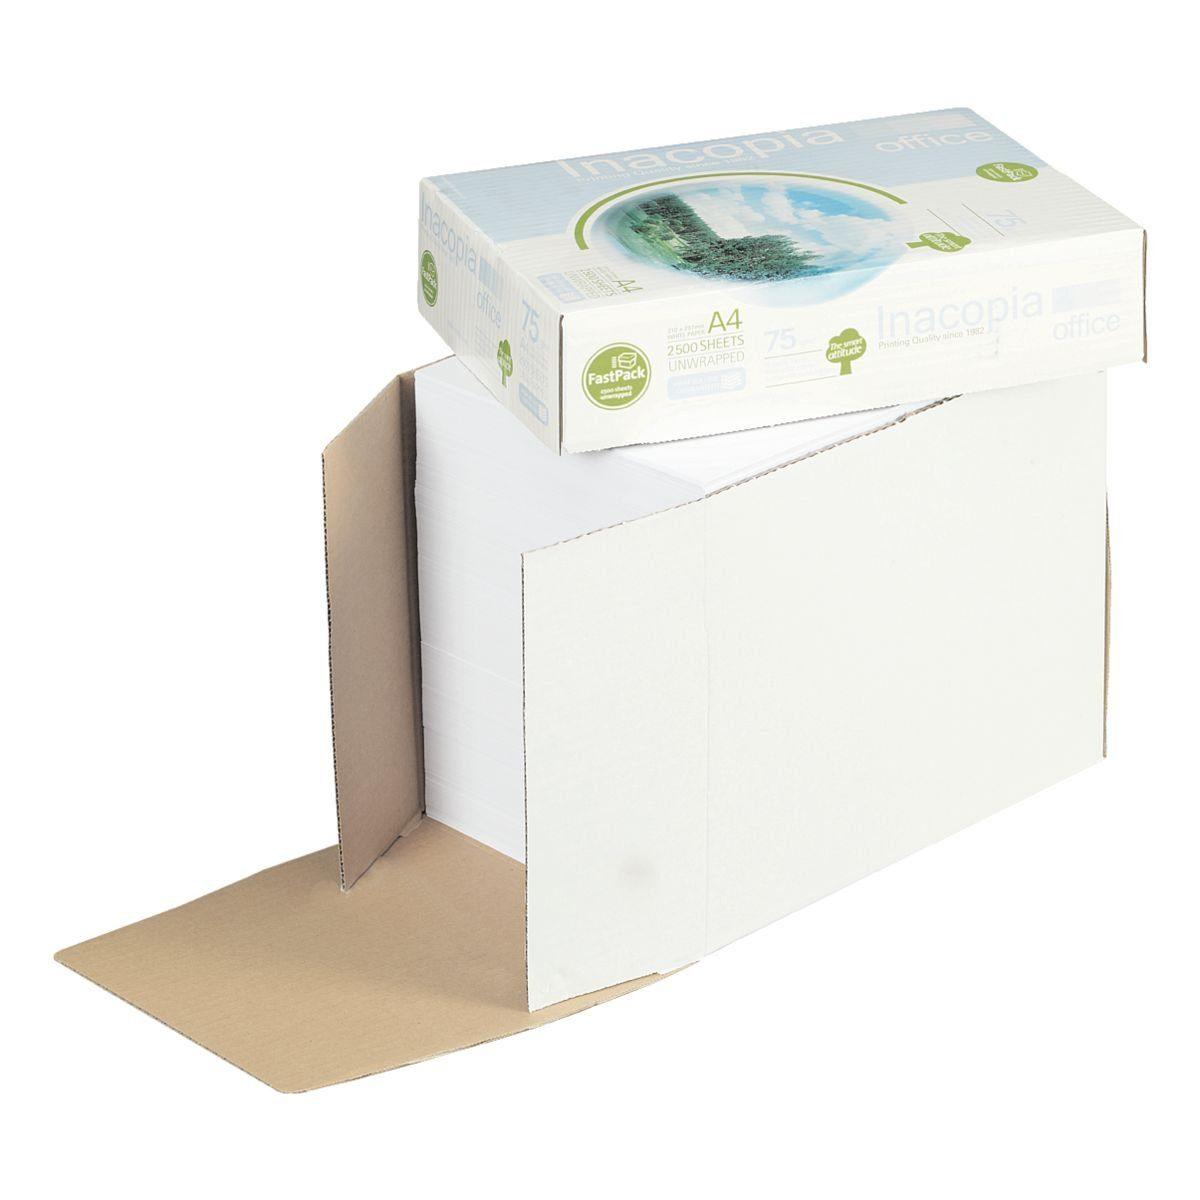 Inacopia Öko-Box Multifunktionales Druckerpapier »Office«